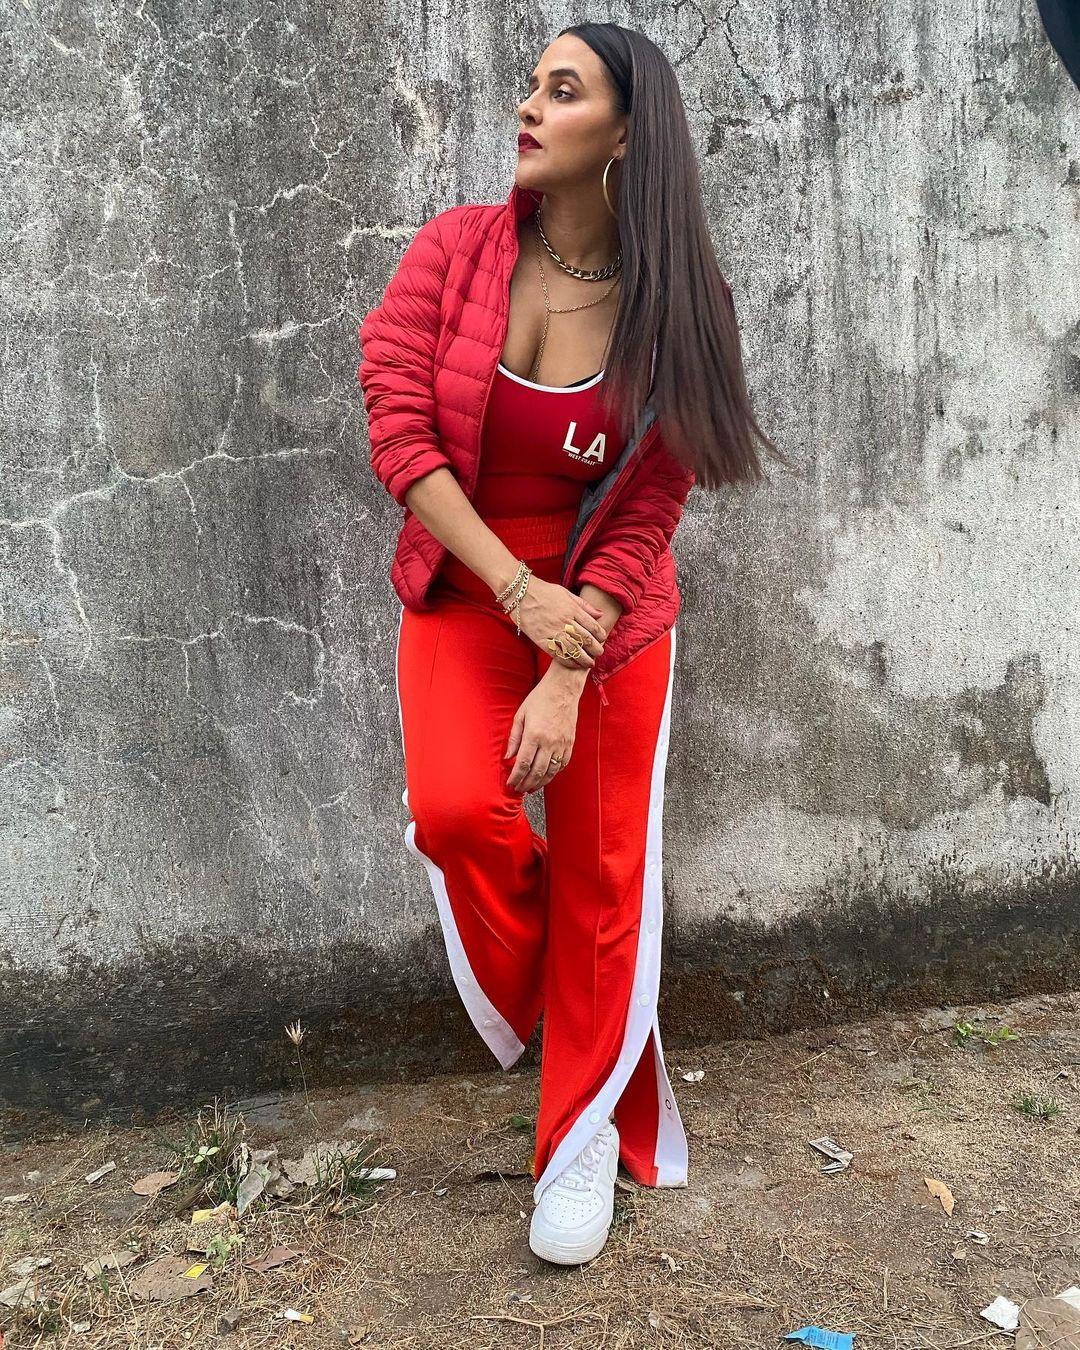 Actress Neha Dhupia Instagram Images (16)